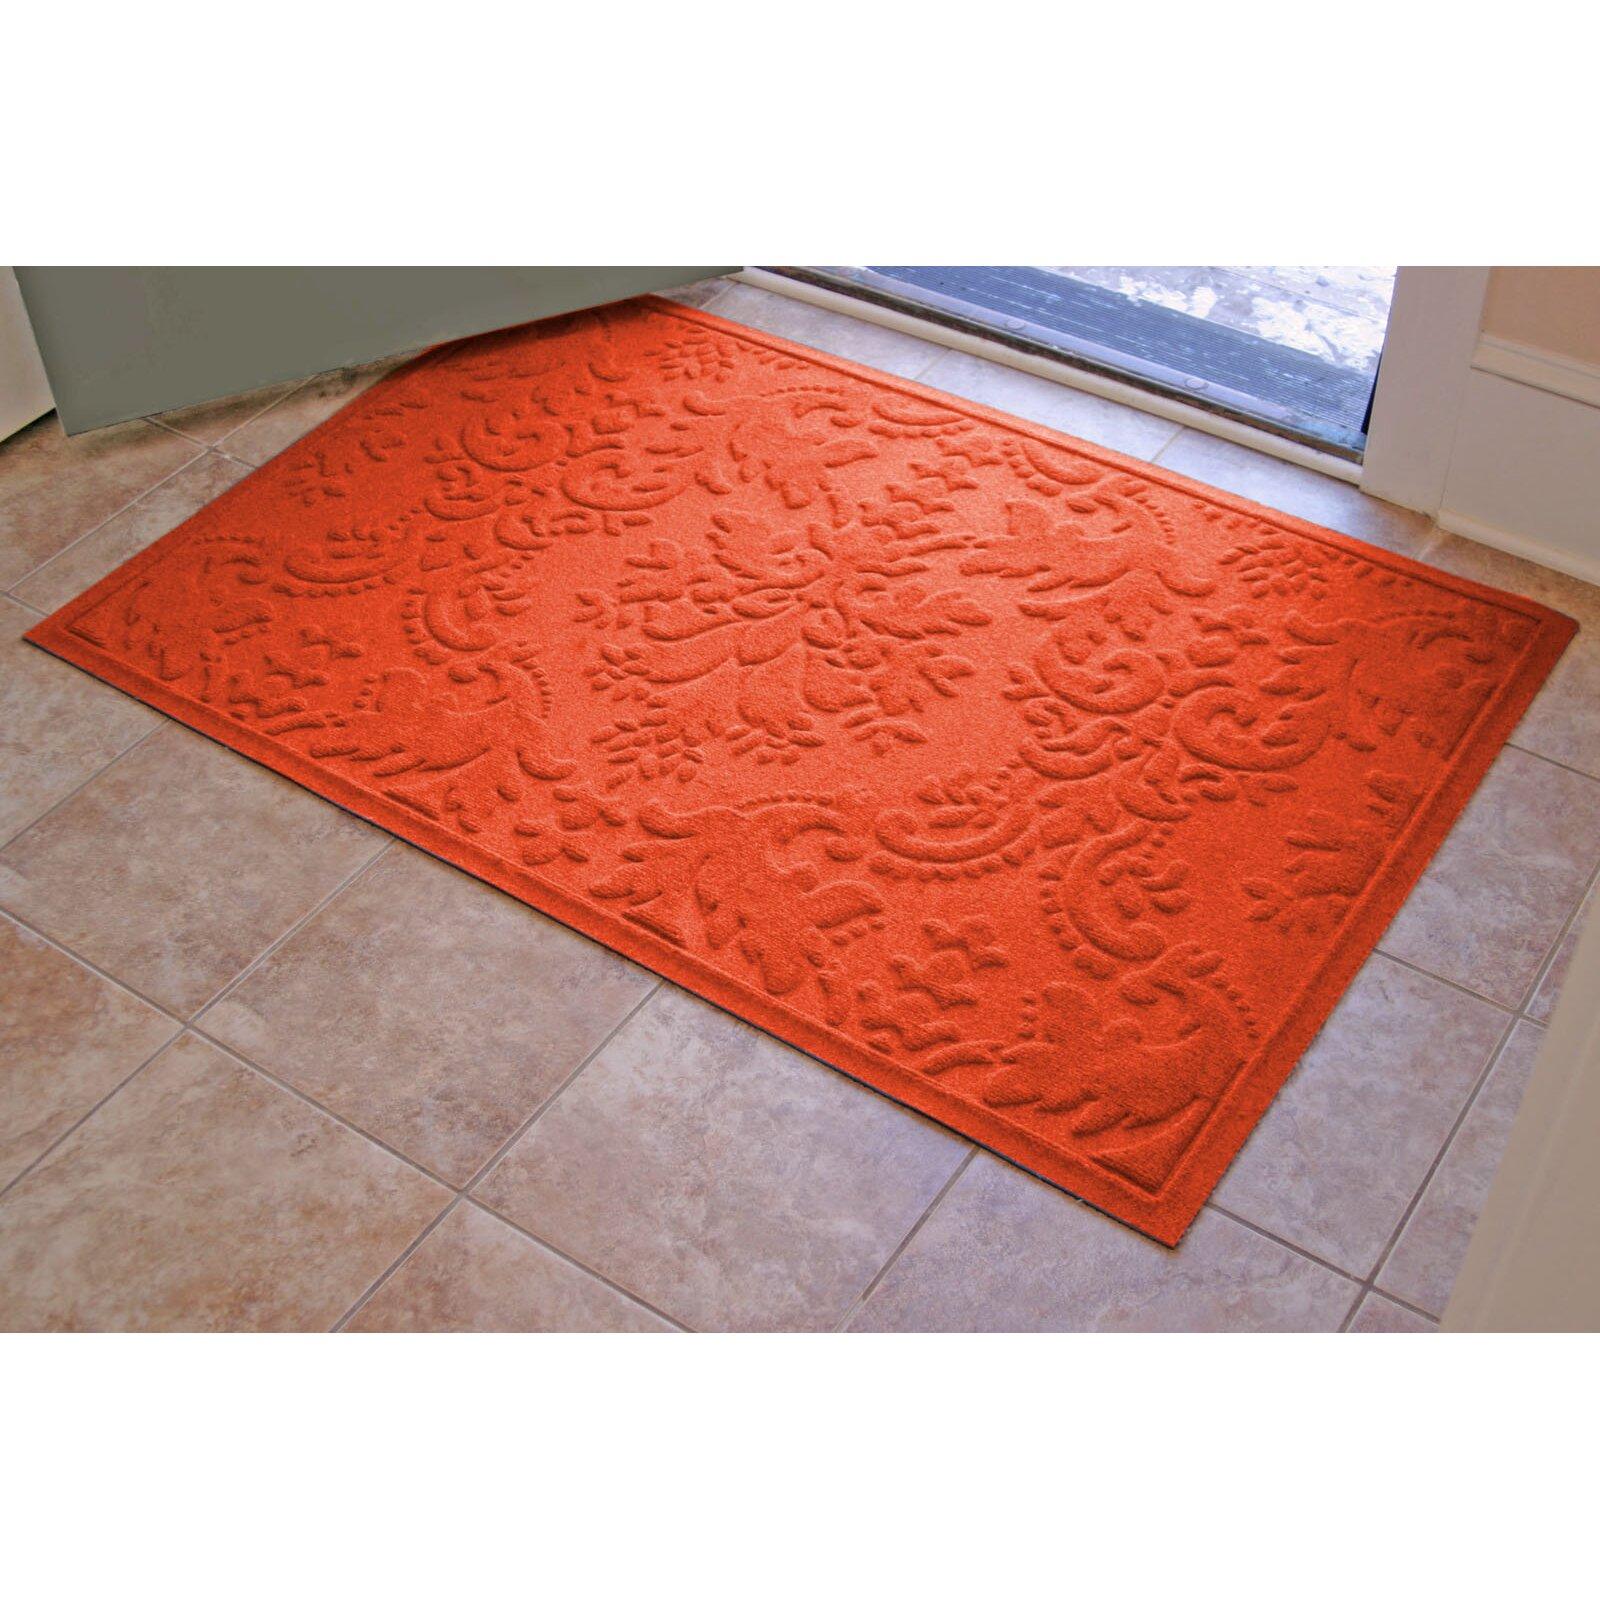 Bungalow Flooring Aqua Shield Damask Doormat & Reviews